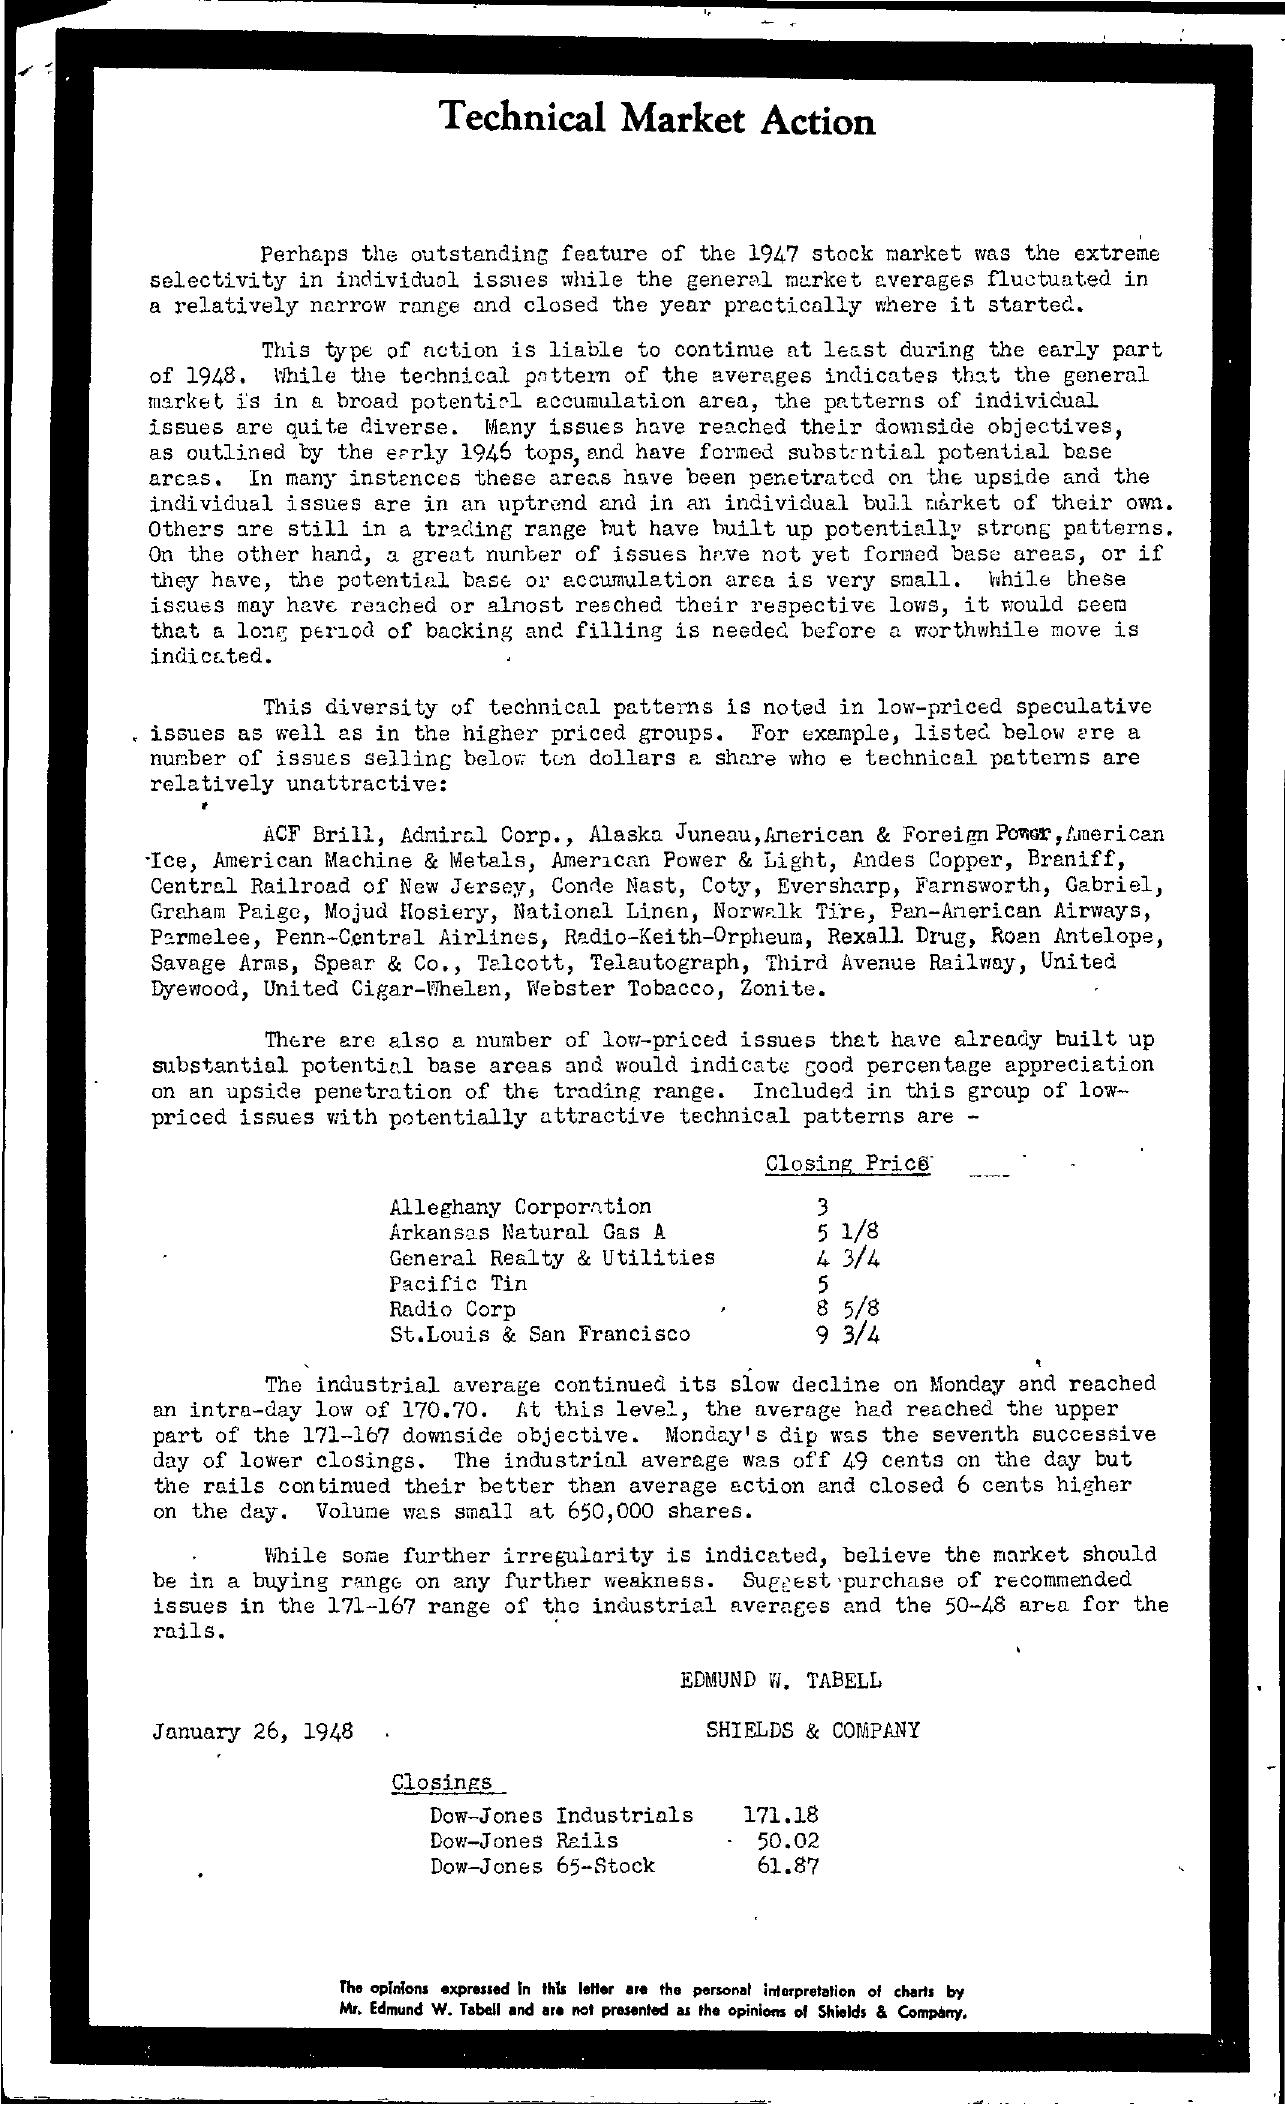 Tabell's Market Letter - January 26, 1948